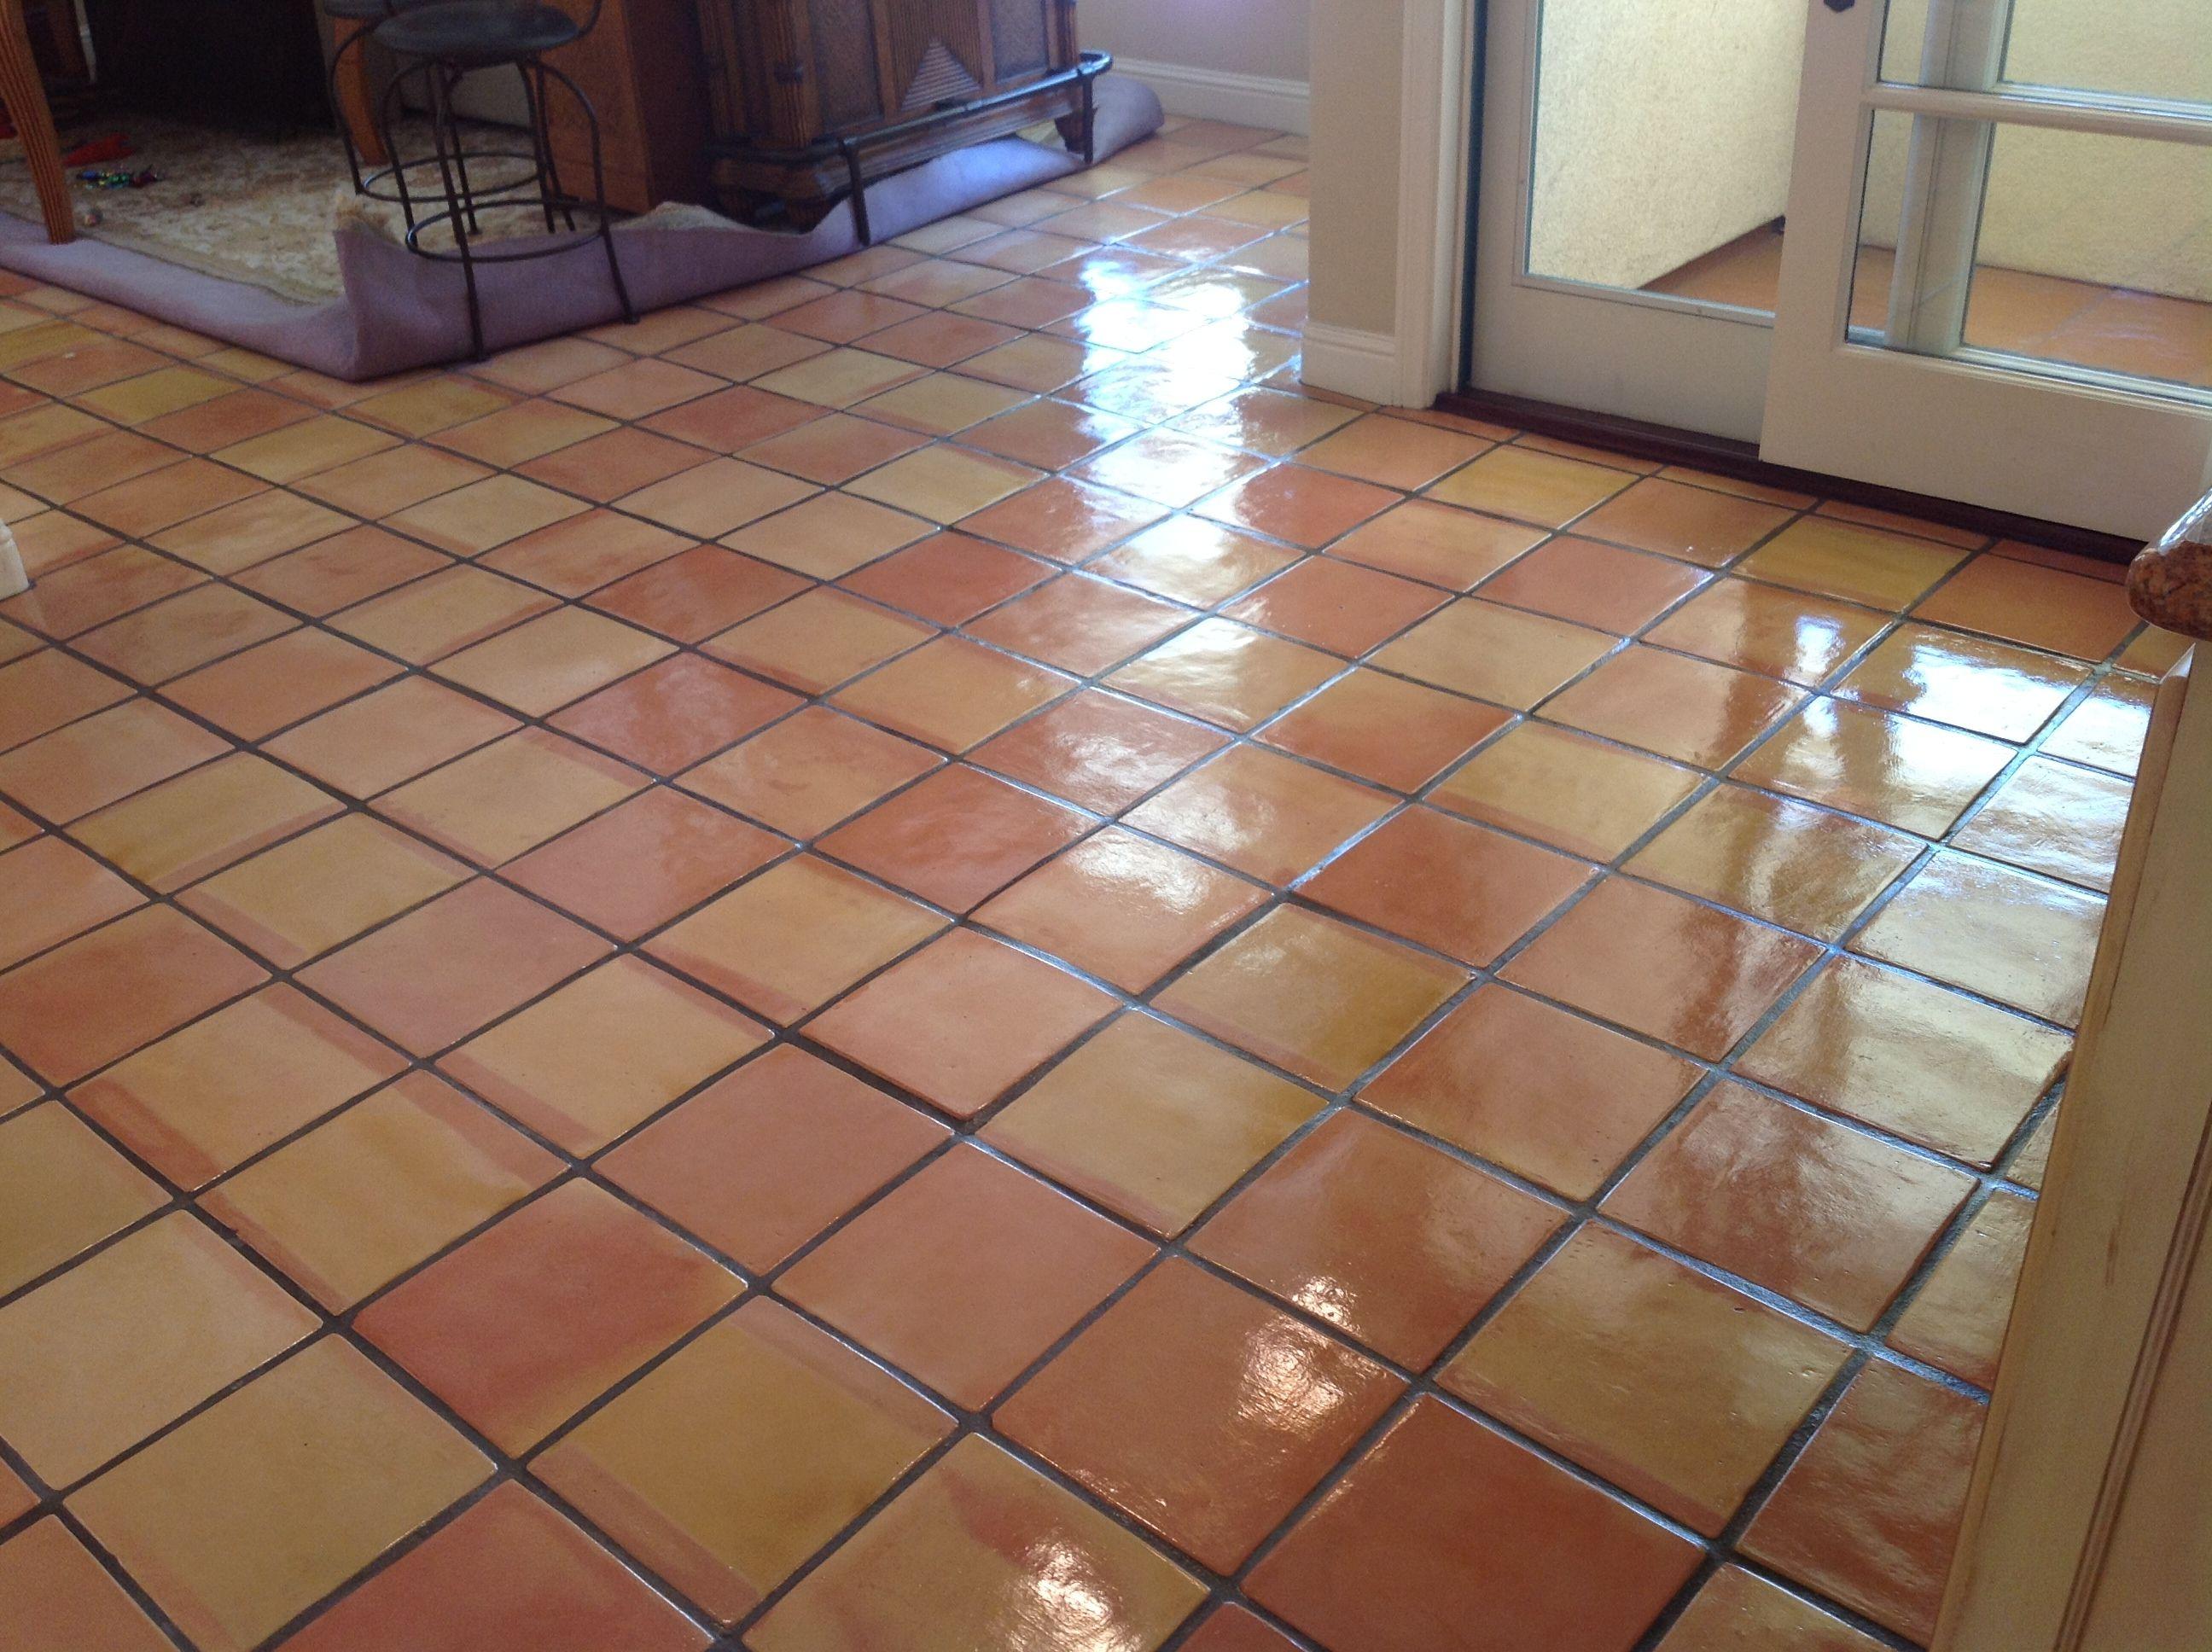 Saltillo tile floor polish httpnextsoft21 pinterest tile flooring saltillo tile floor polish dailygadgetfo Image collections